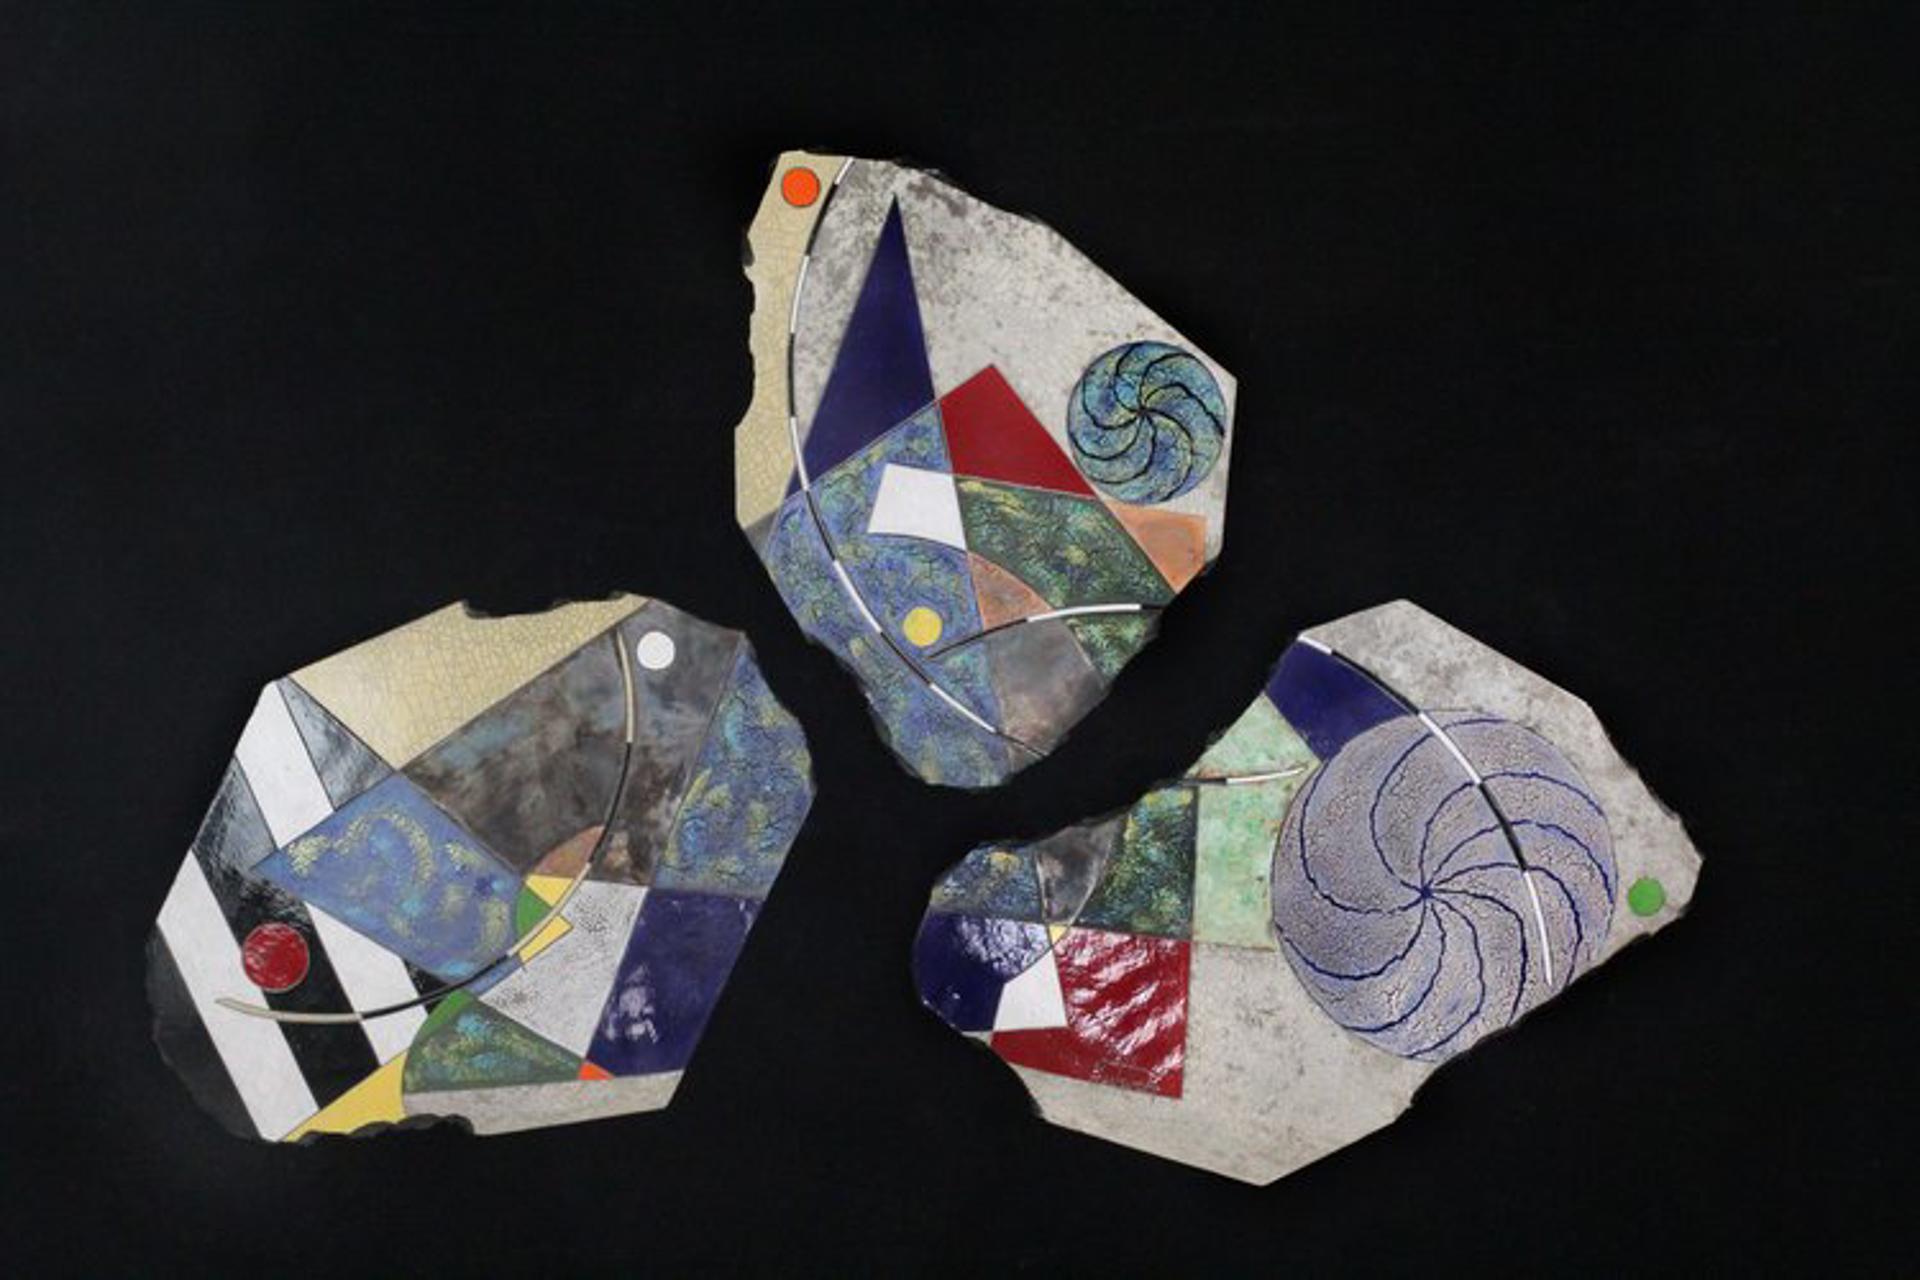 4th Street Blues (Triptych) by Michael Gustavson